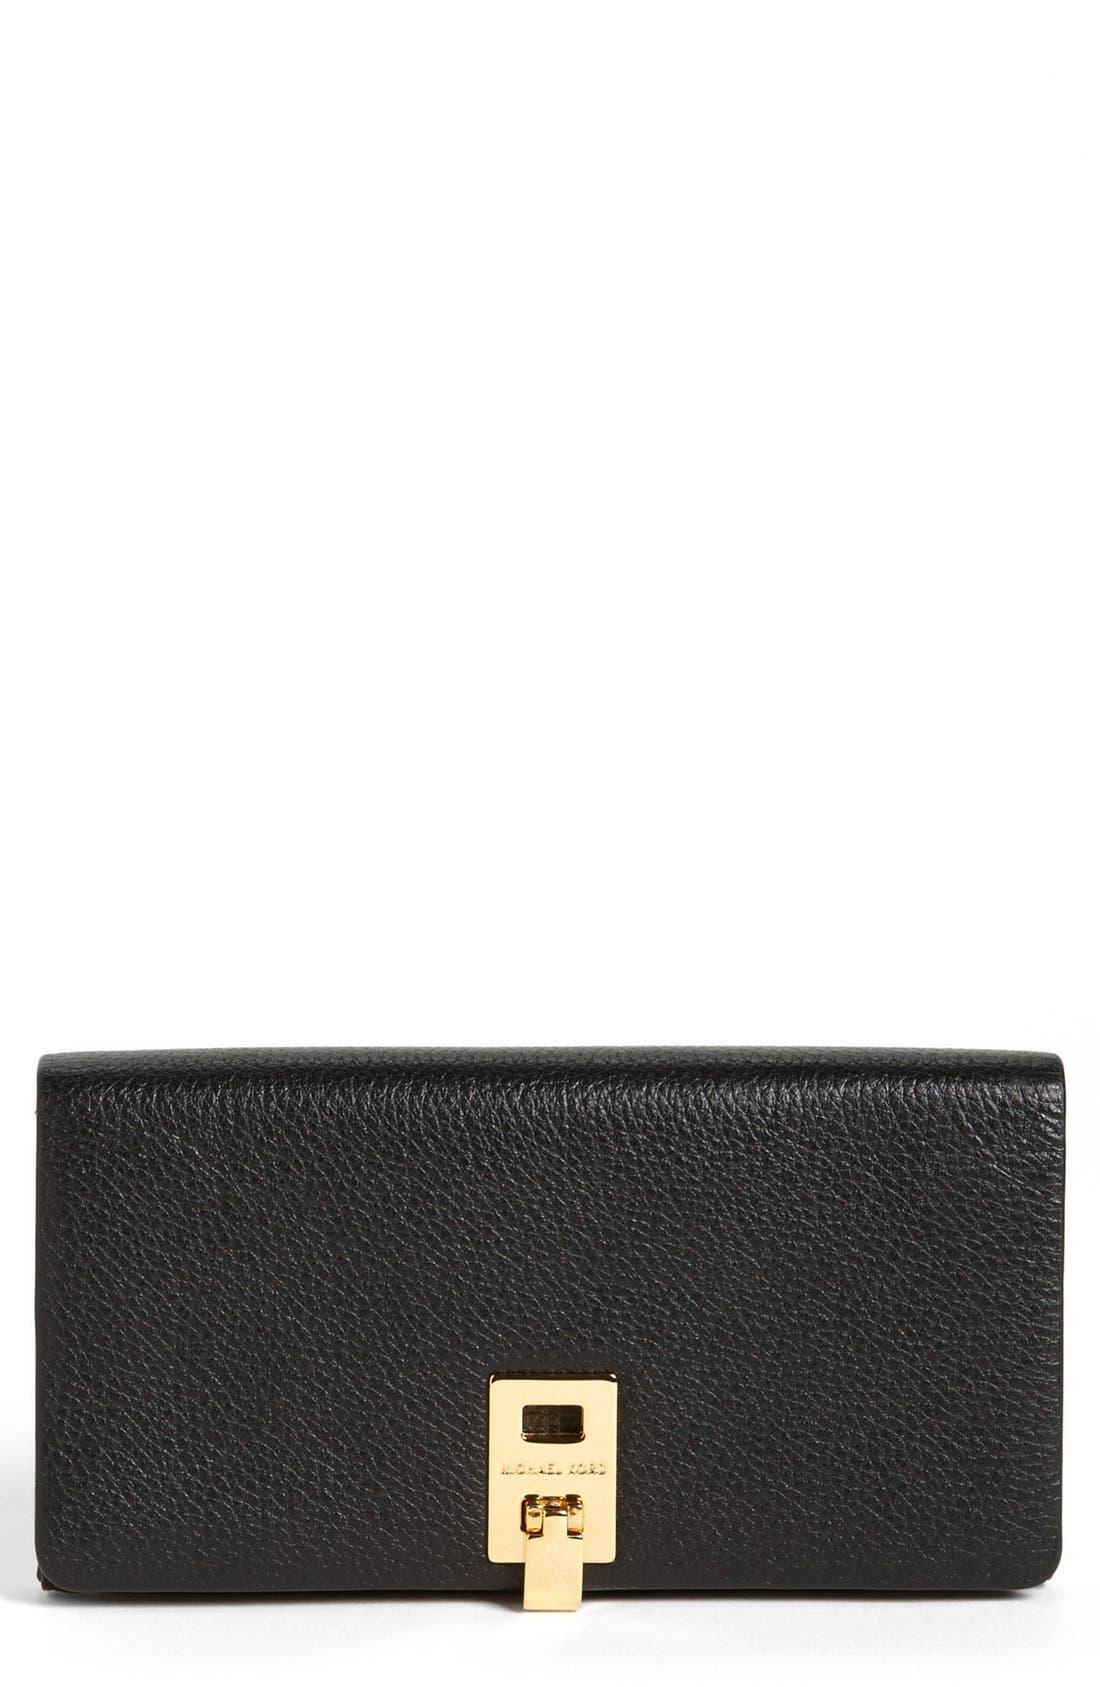 Alternate Image 1 Selected - Michael Kors 'Miranda' Continental Wallet